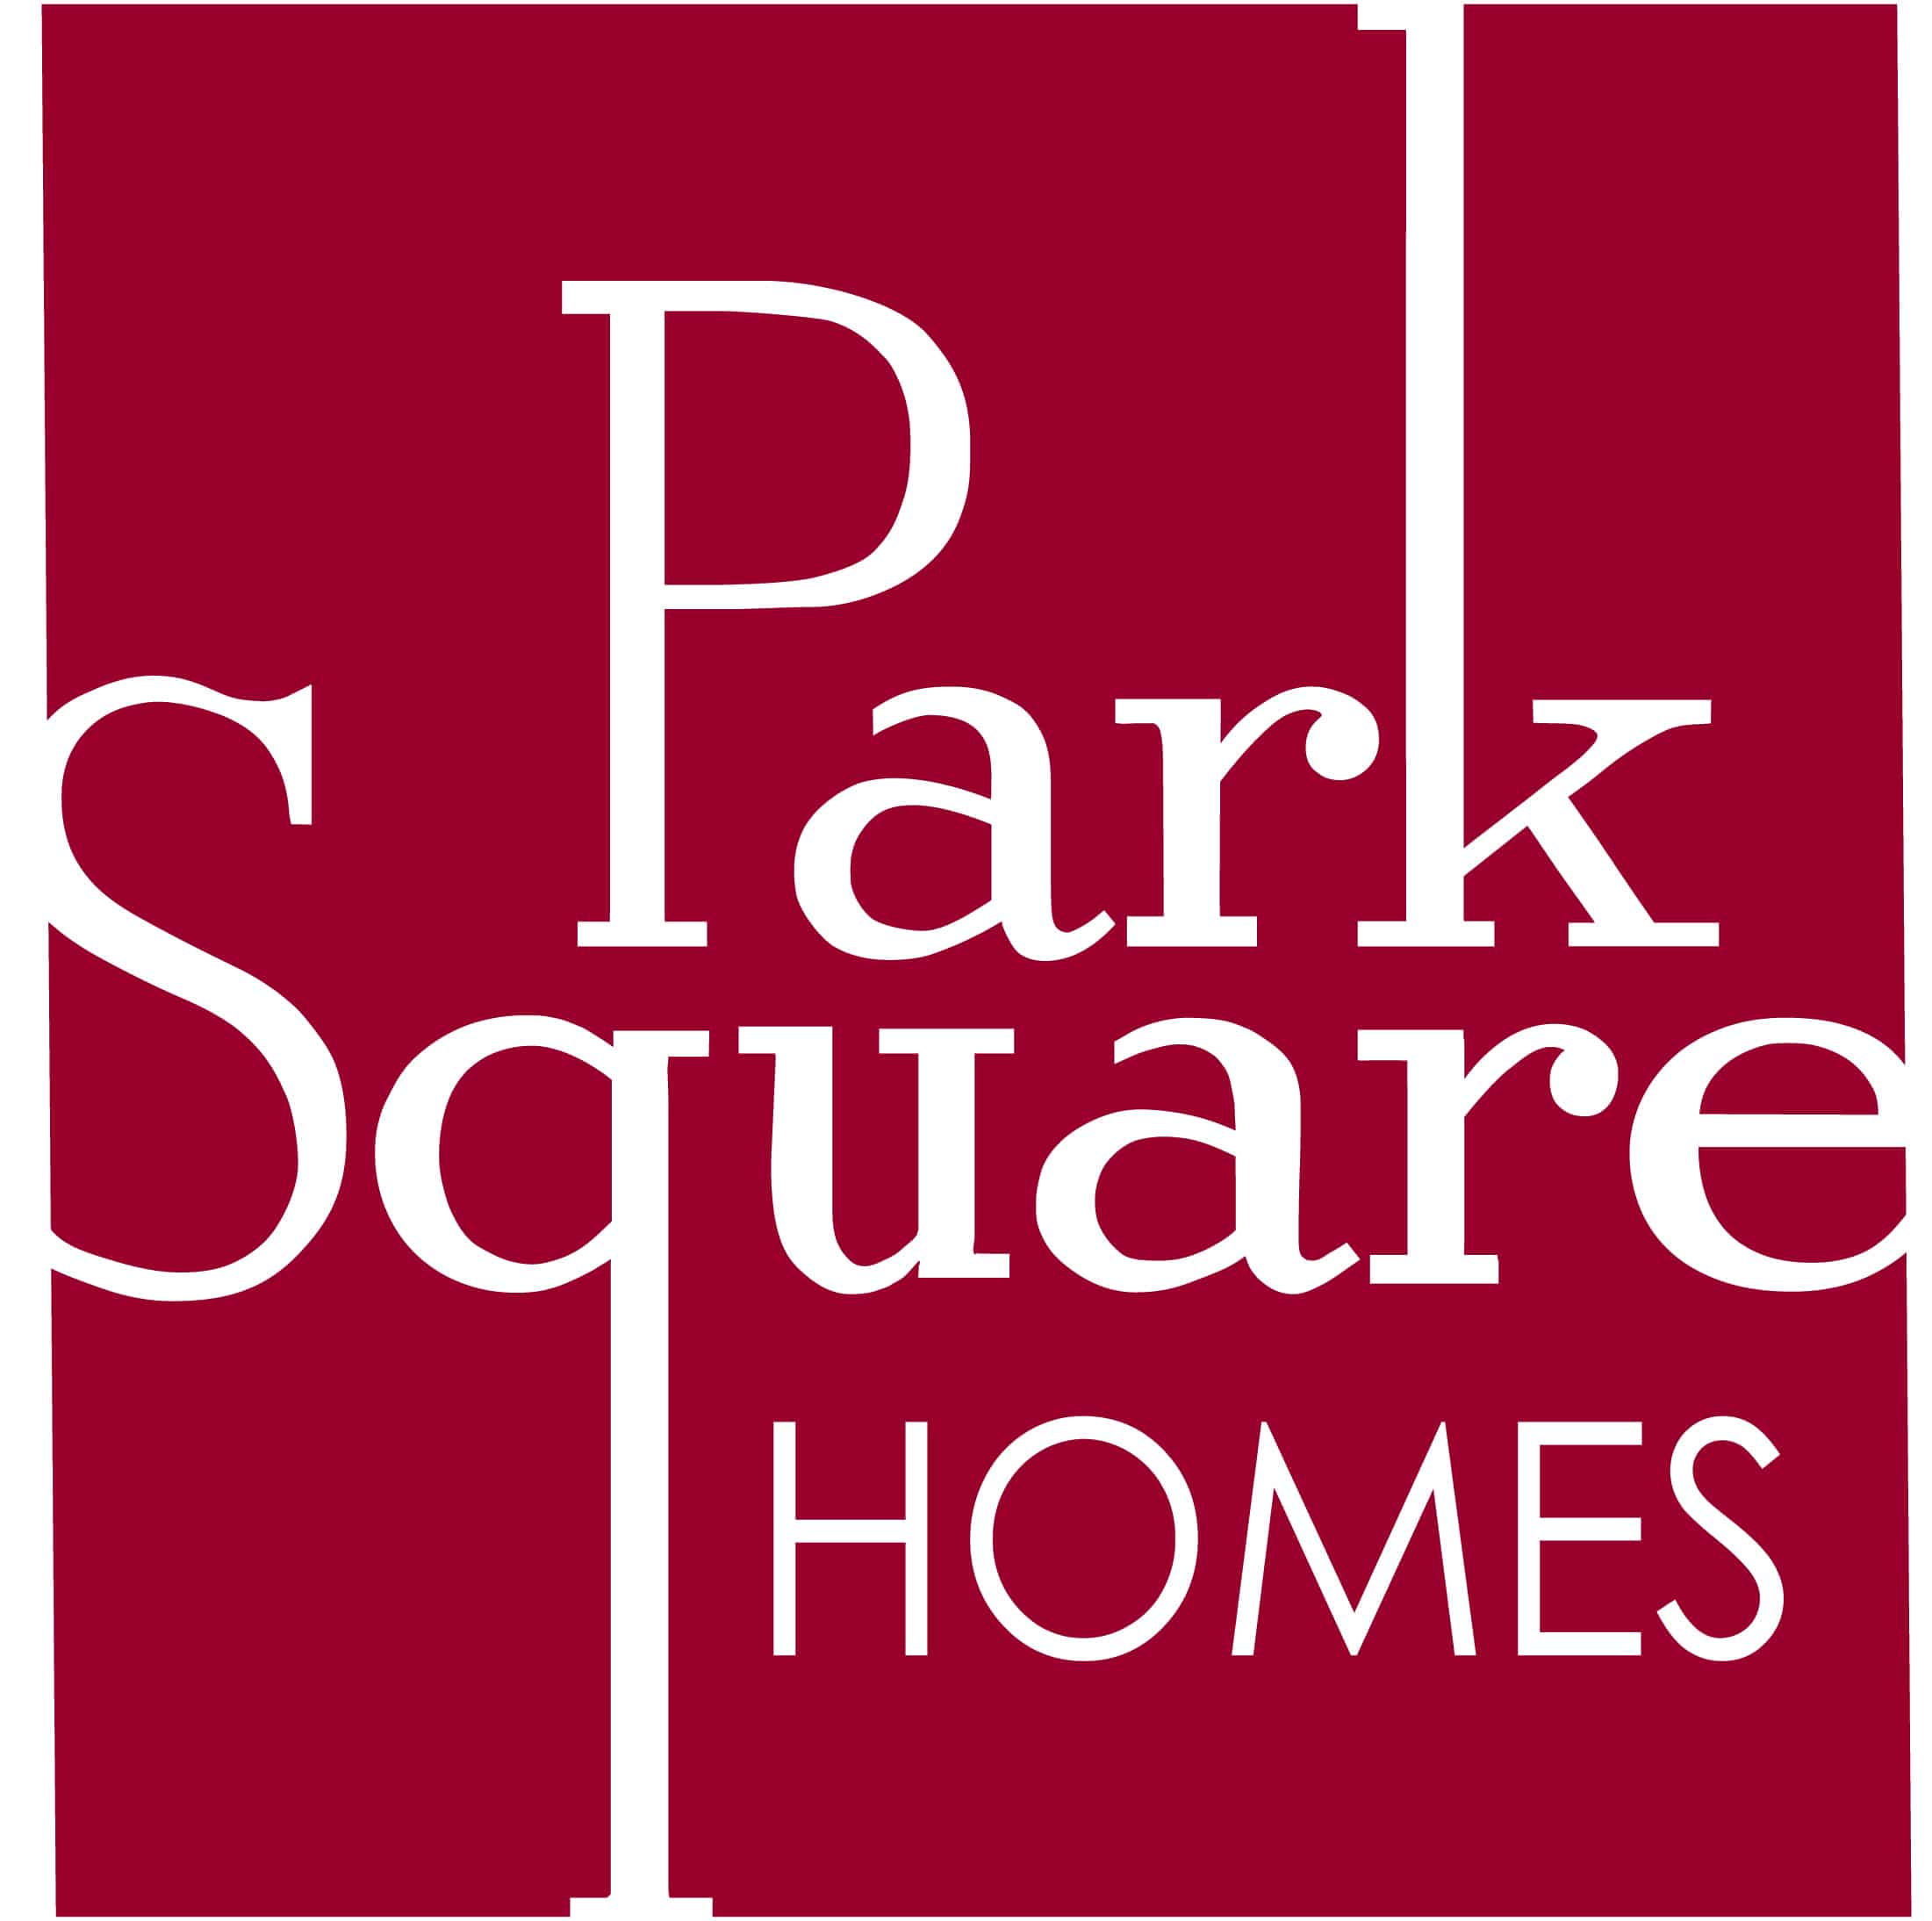 Park Square Homes company name